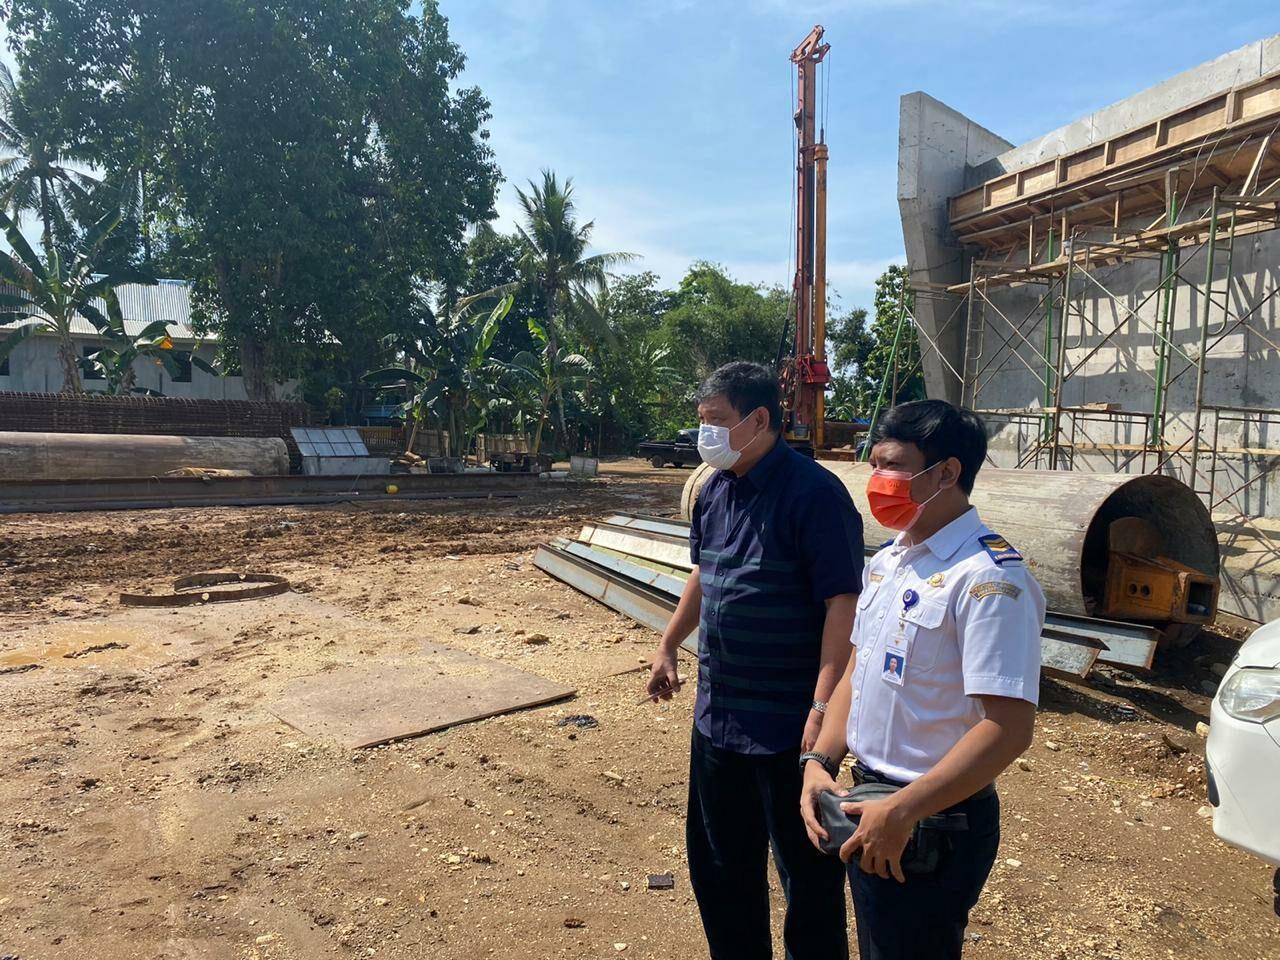 Kemenko Marves Gelar Rapat Koordinasi Progress Pembangunan Penopang Logistik Wilayah Timur: Terminal Multipurpose Wae Kelambu